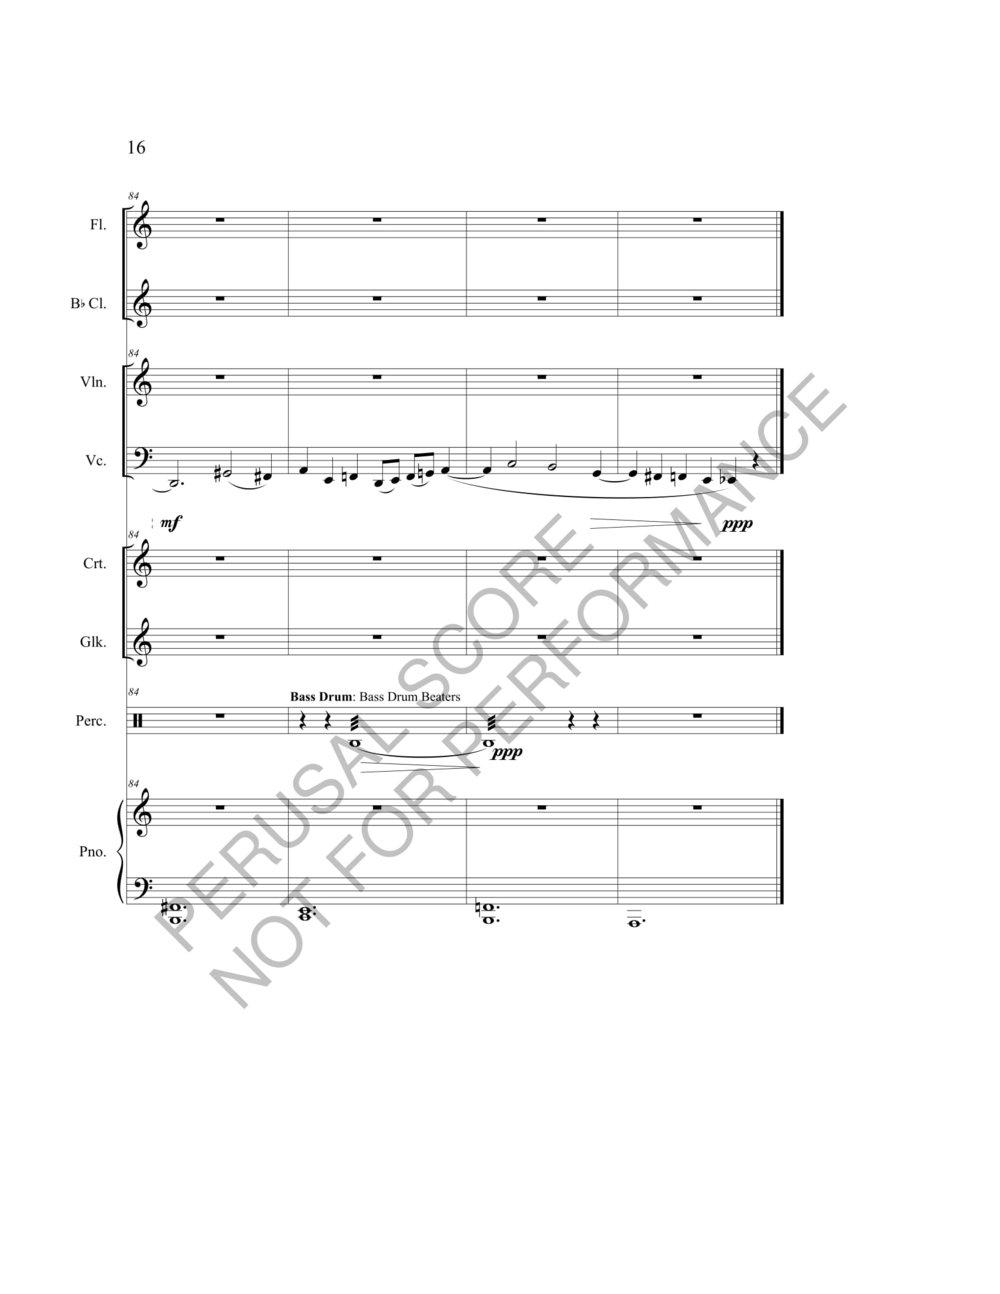 Boyd Terra Liberi Score-watermark-22.jpg